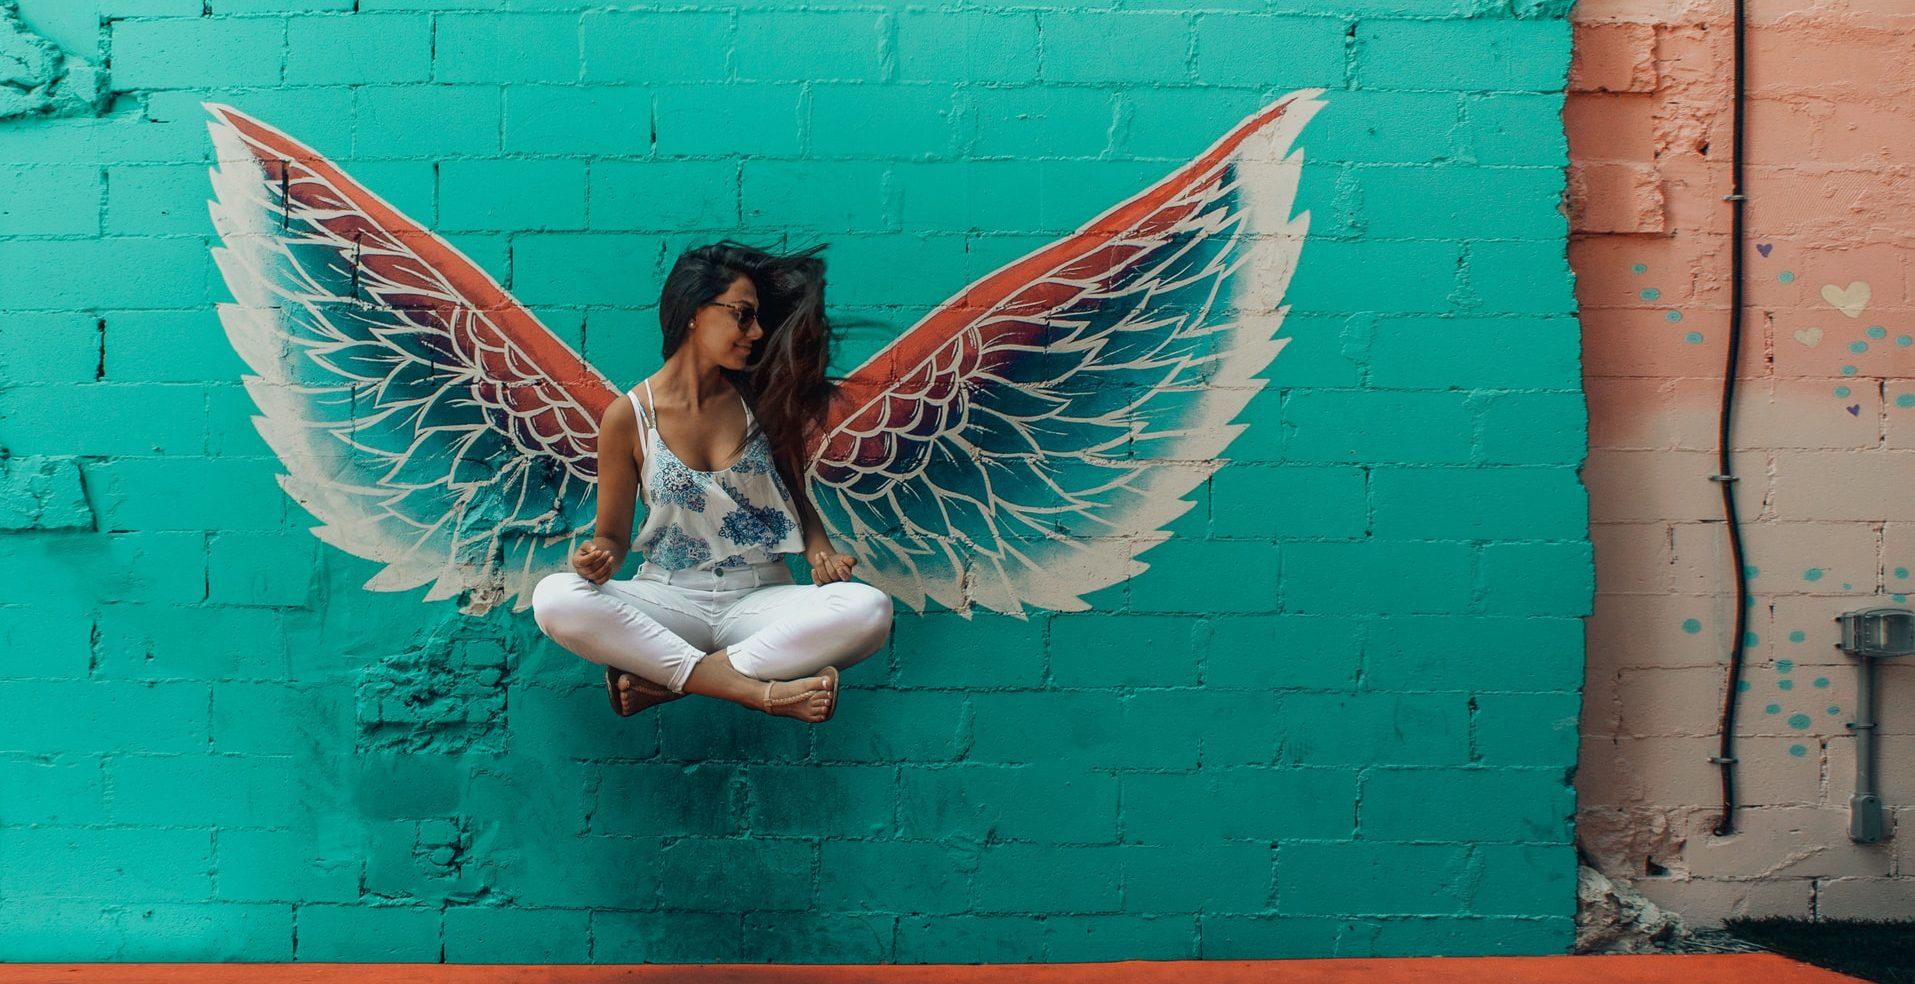 Rediscovering Yourself Through Mindfulness 自分らしく生きるための第一歩 ~自分の心と向き合っていますか?